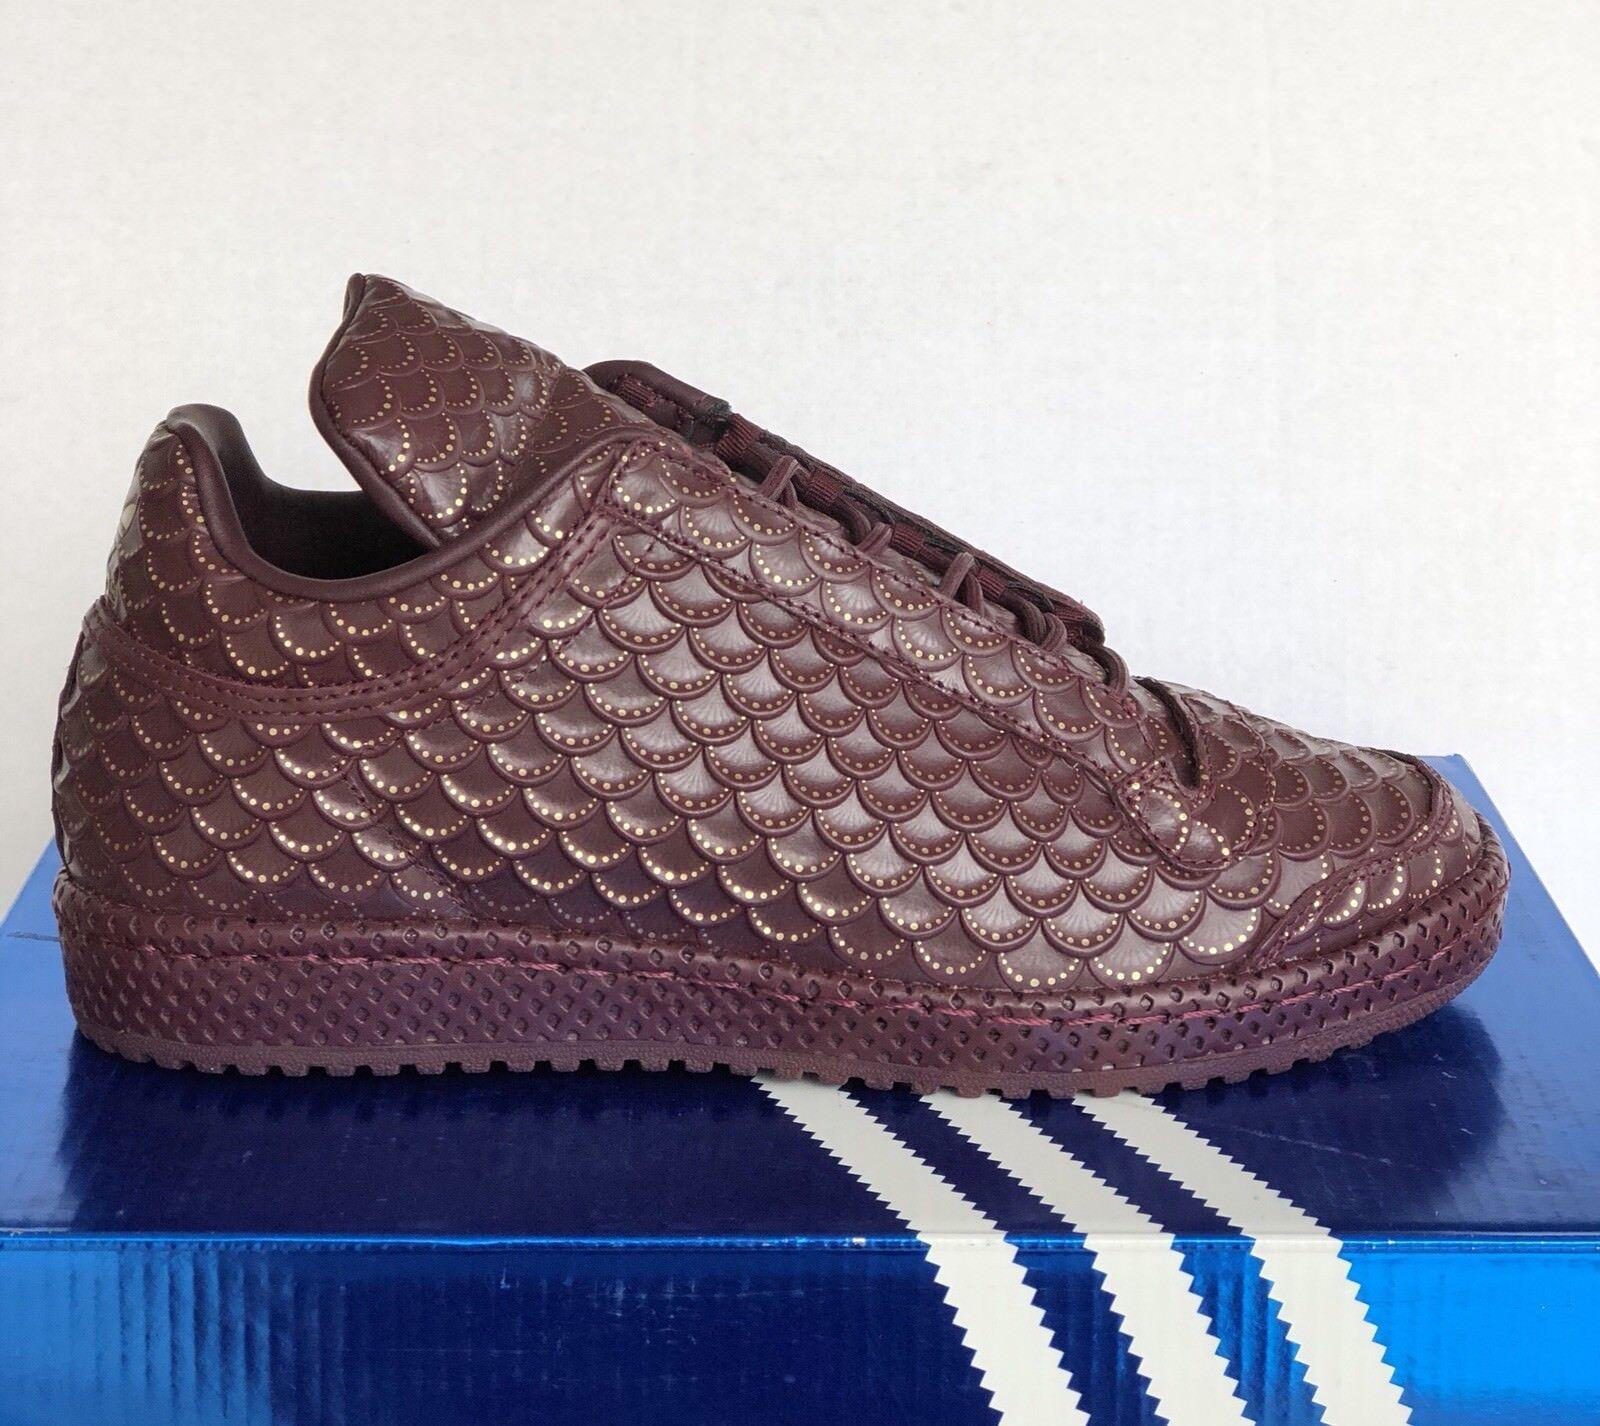 Adidas zehn mitte pc - braune gold flakes (d70353)  neu  sz